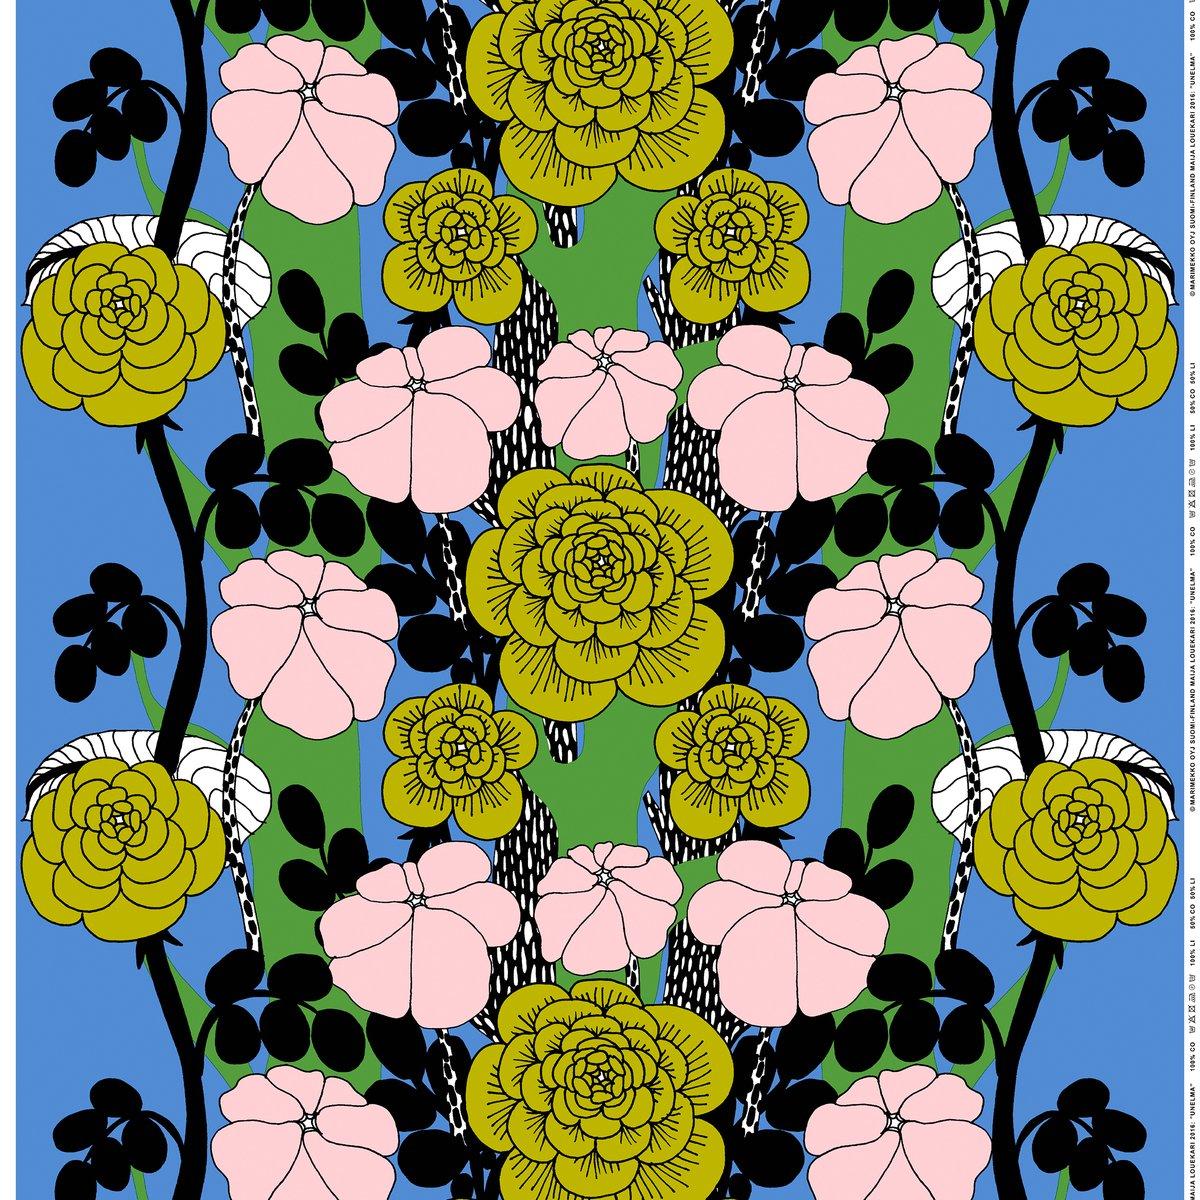 Marimekko Unelma Fabric Light Blue Green Pink Finnish